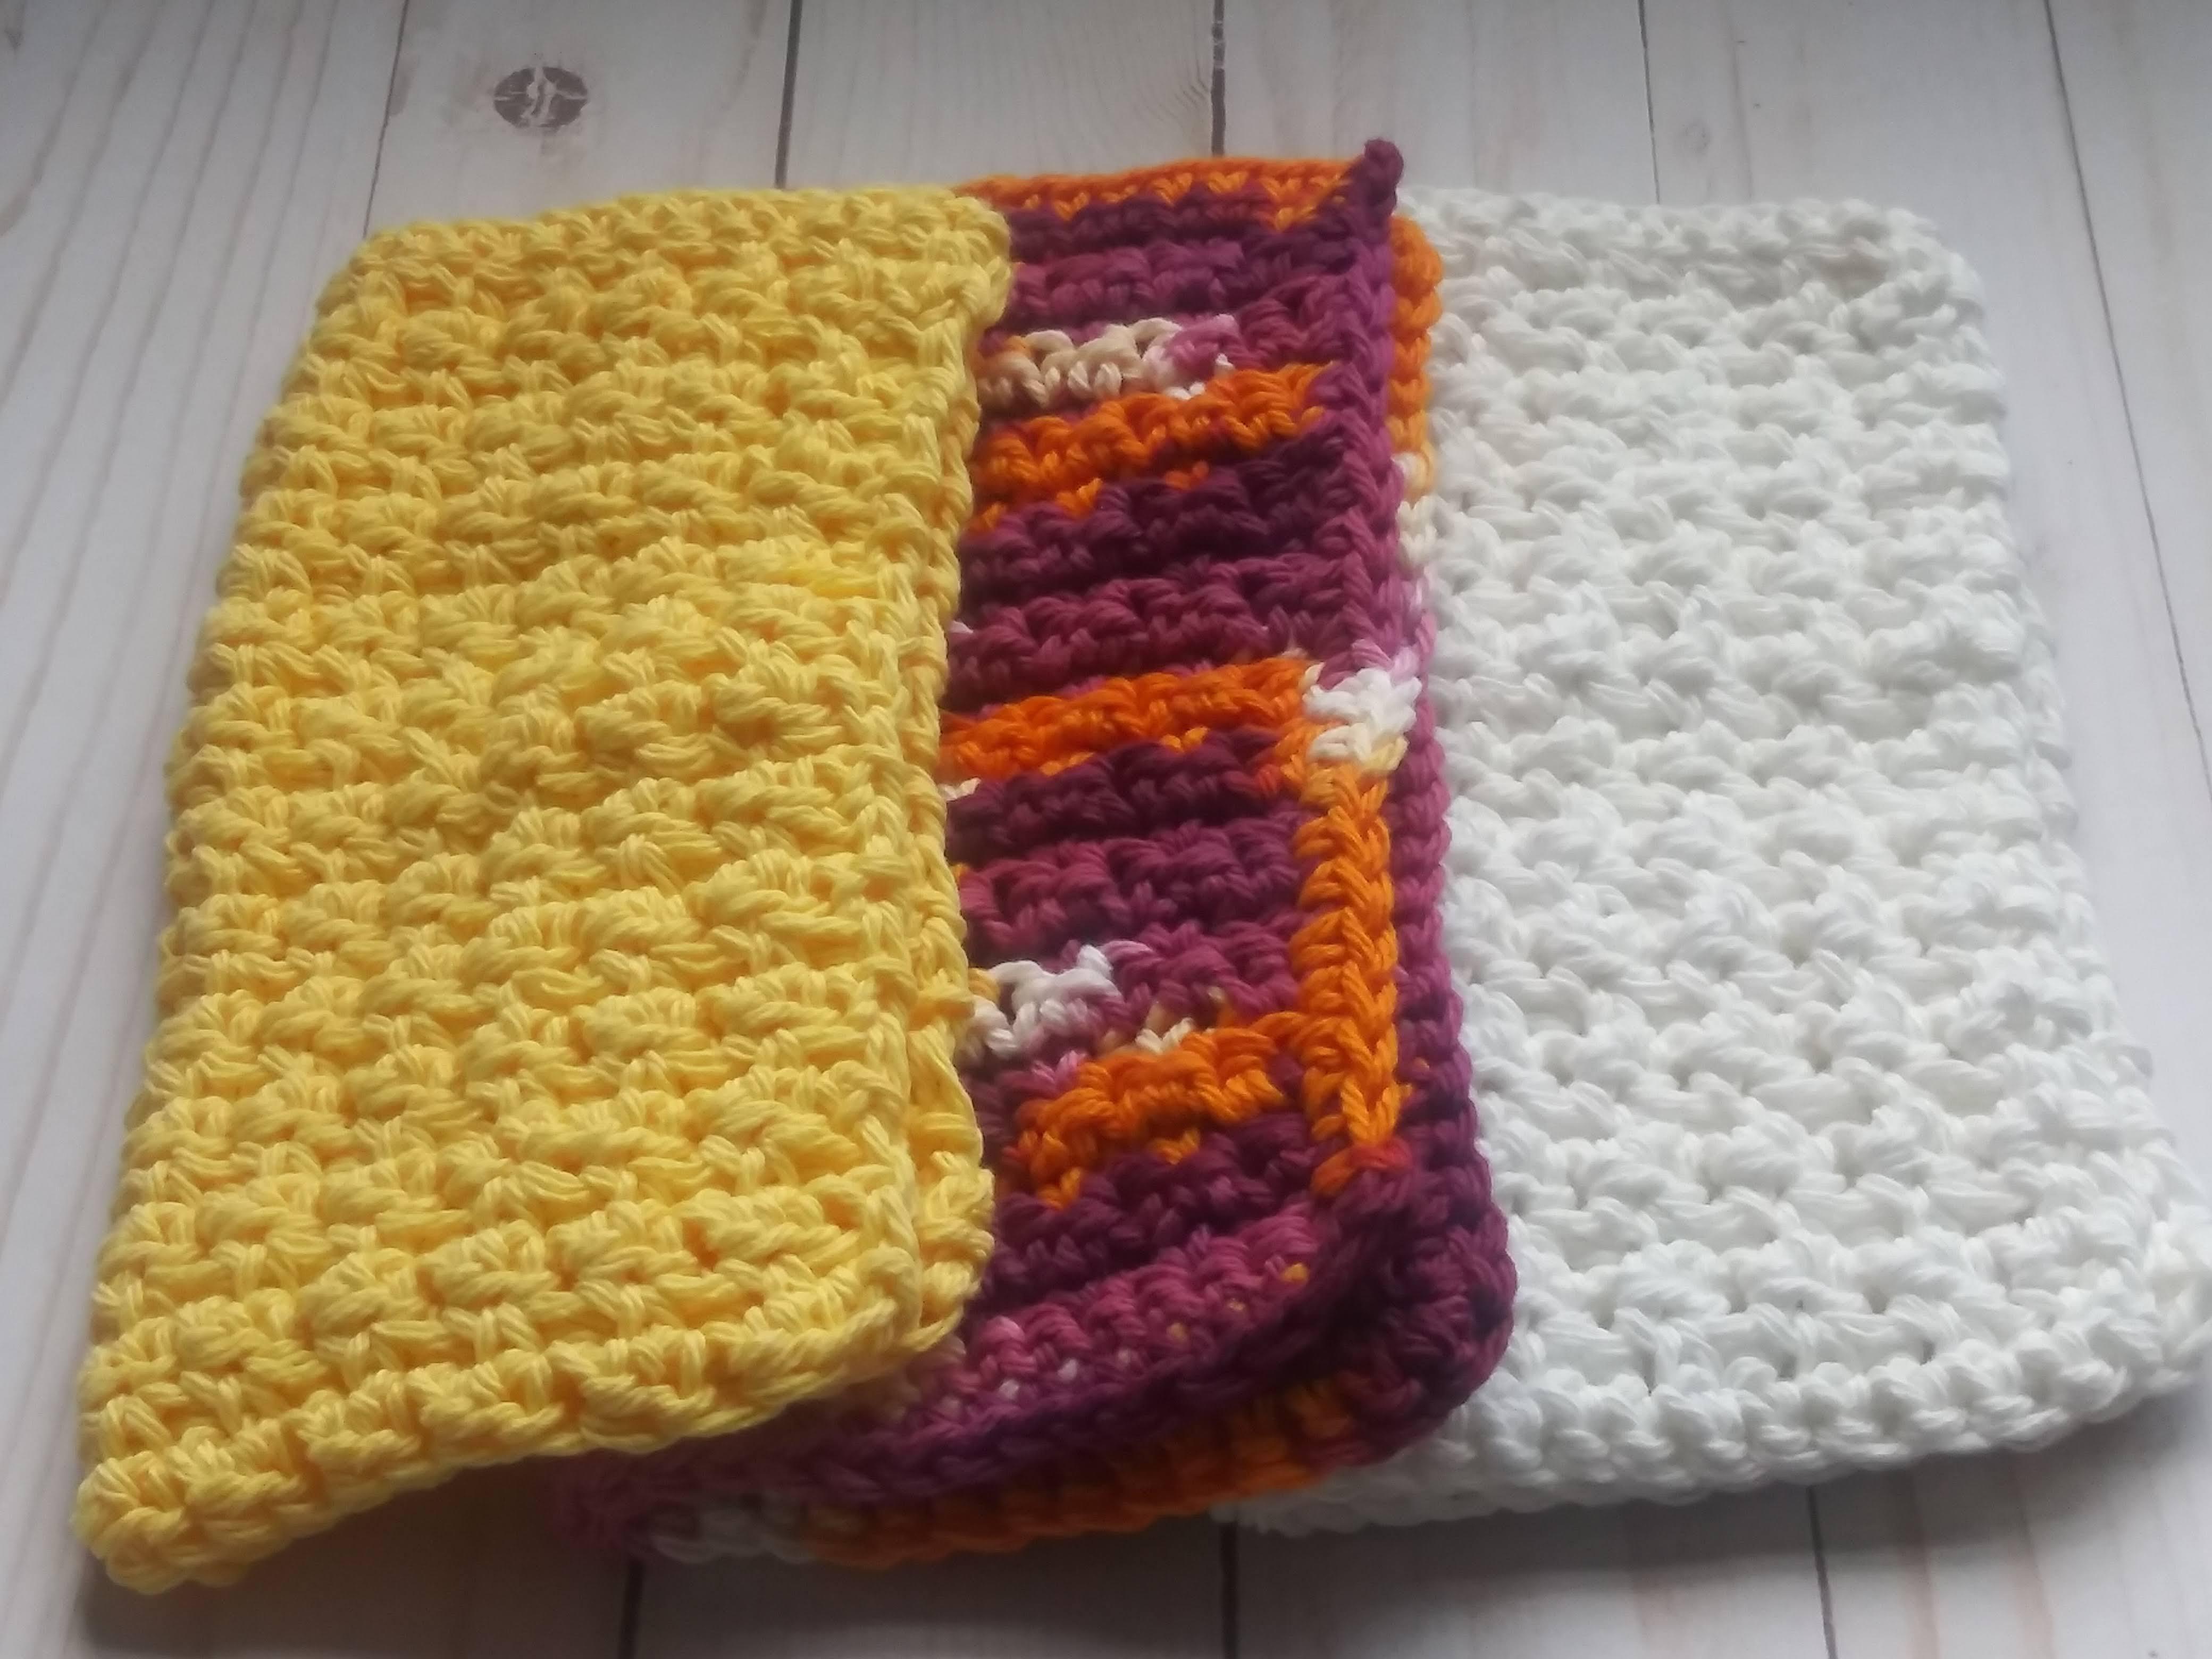 Set of 3 - Textured Washcloths or Dishcloths